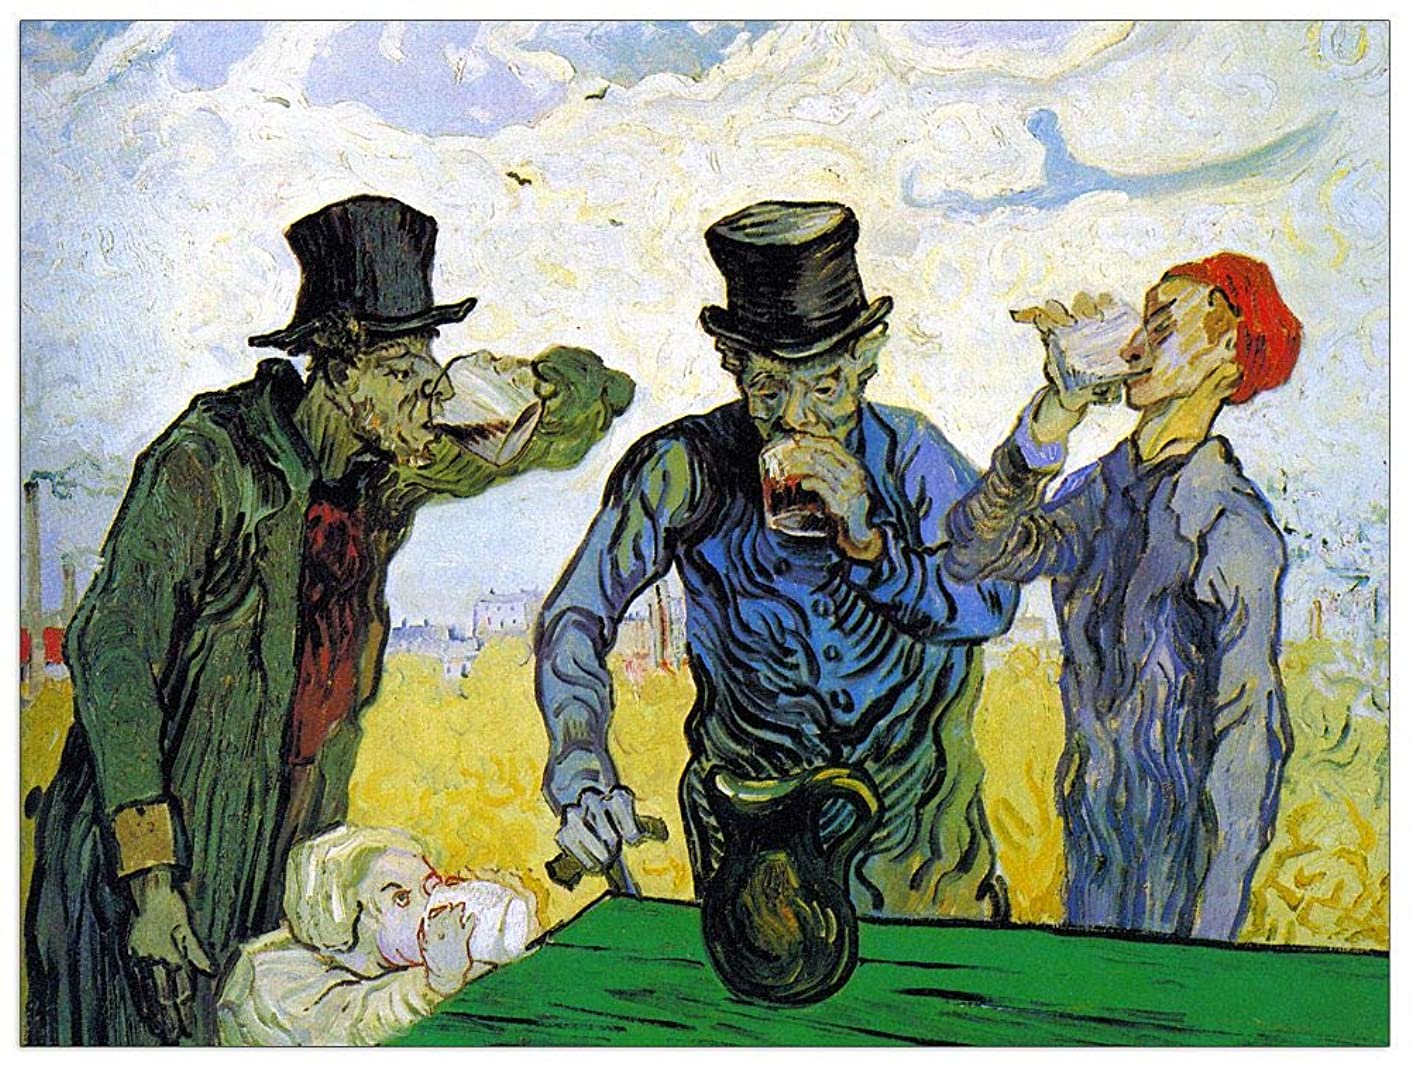 ArtPlaza TW91043 Van Gogh Vincent-Drinkers Decorative Panel, 51x39.5 Inch, Multicolored